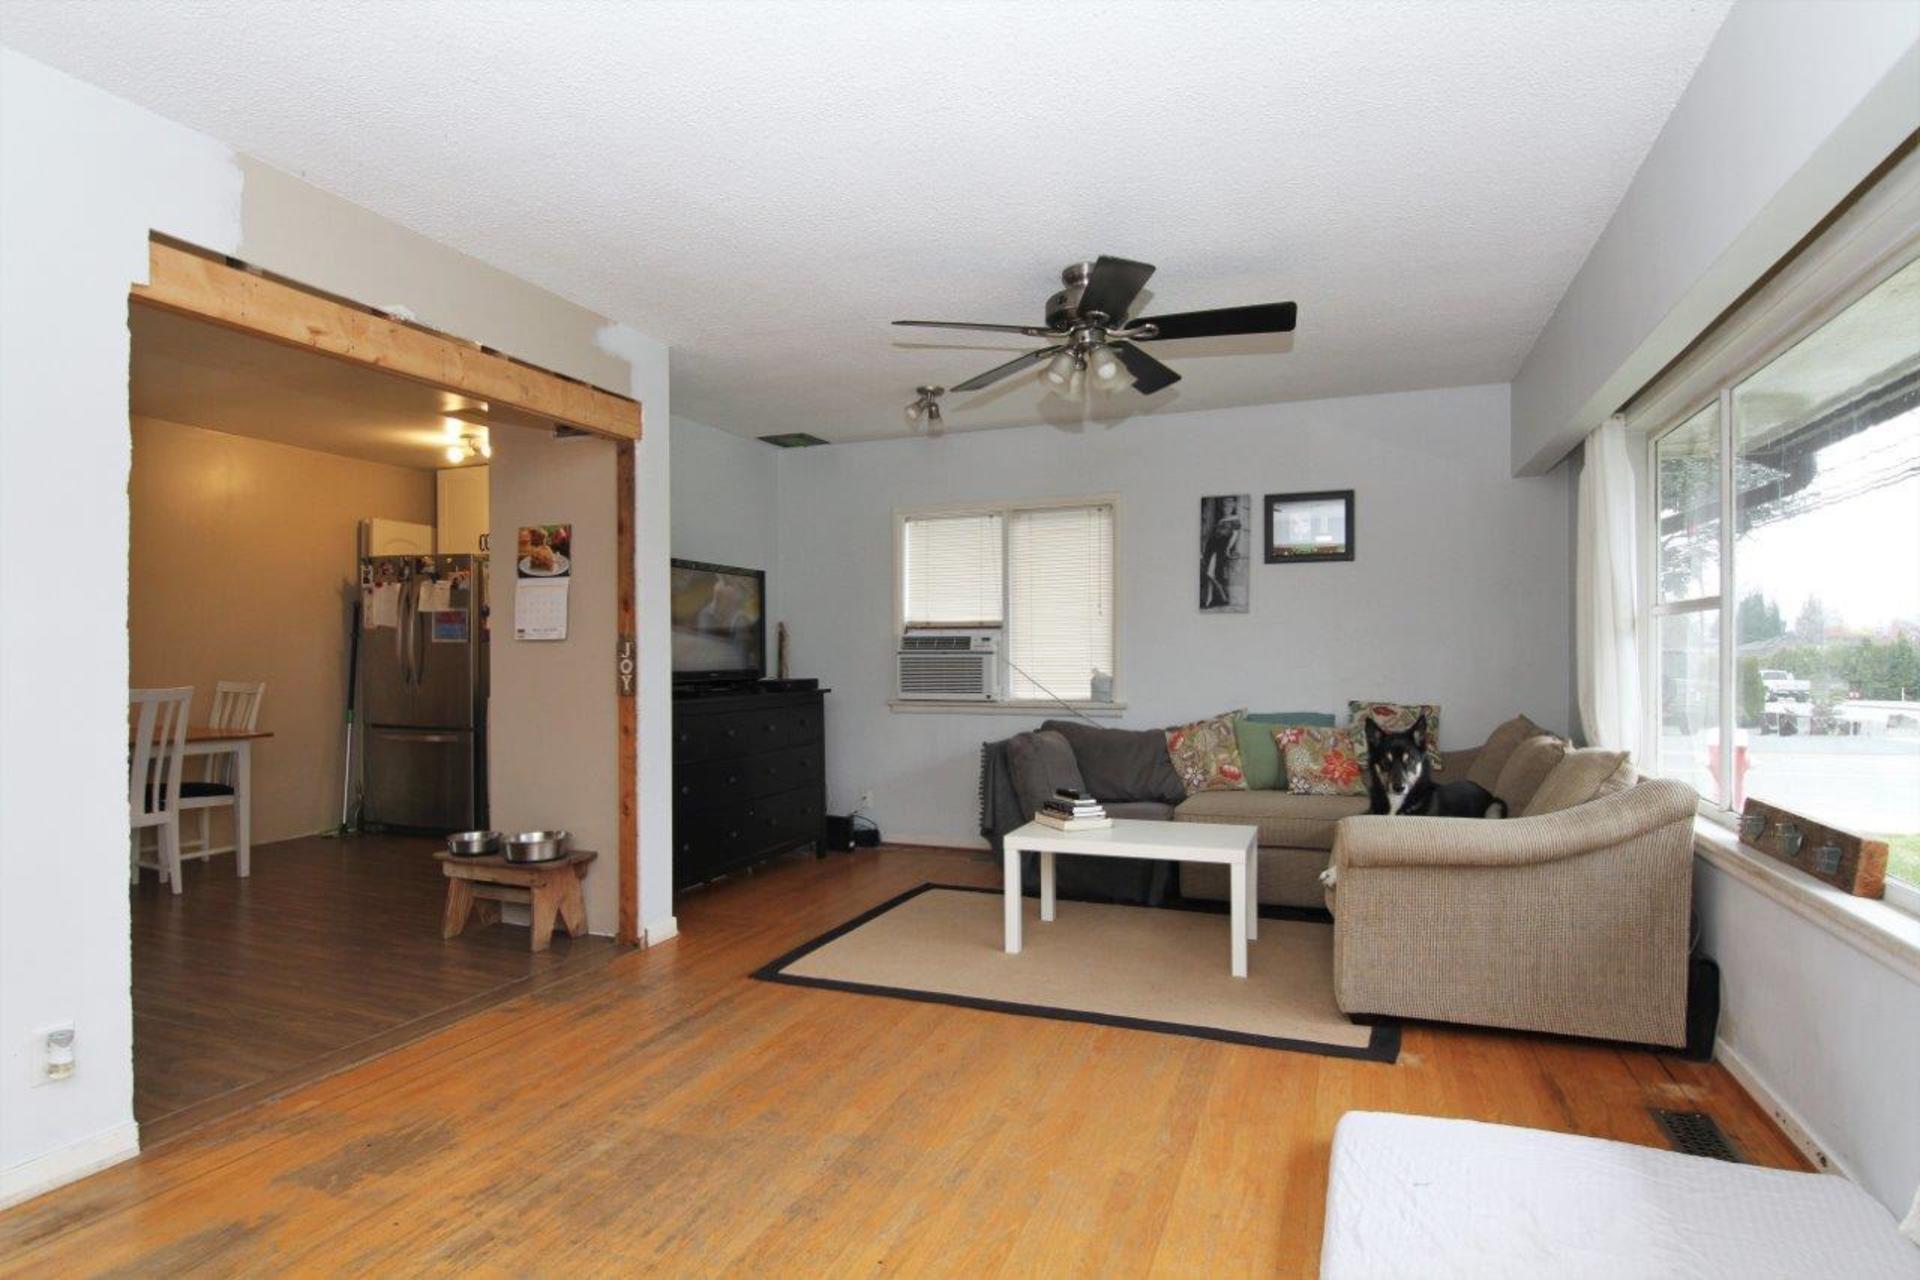 12351-203-street-west-central-maple-ridge-02 at 12351 203 Street, West Central, Maple Ridge